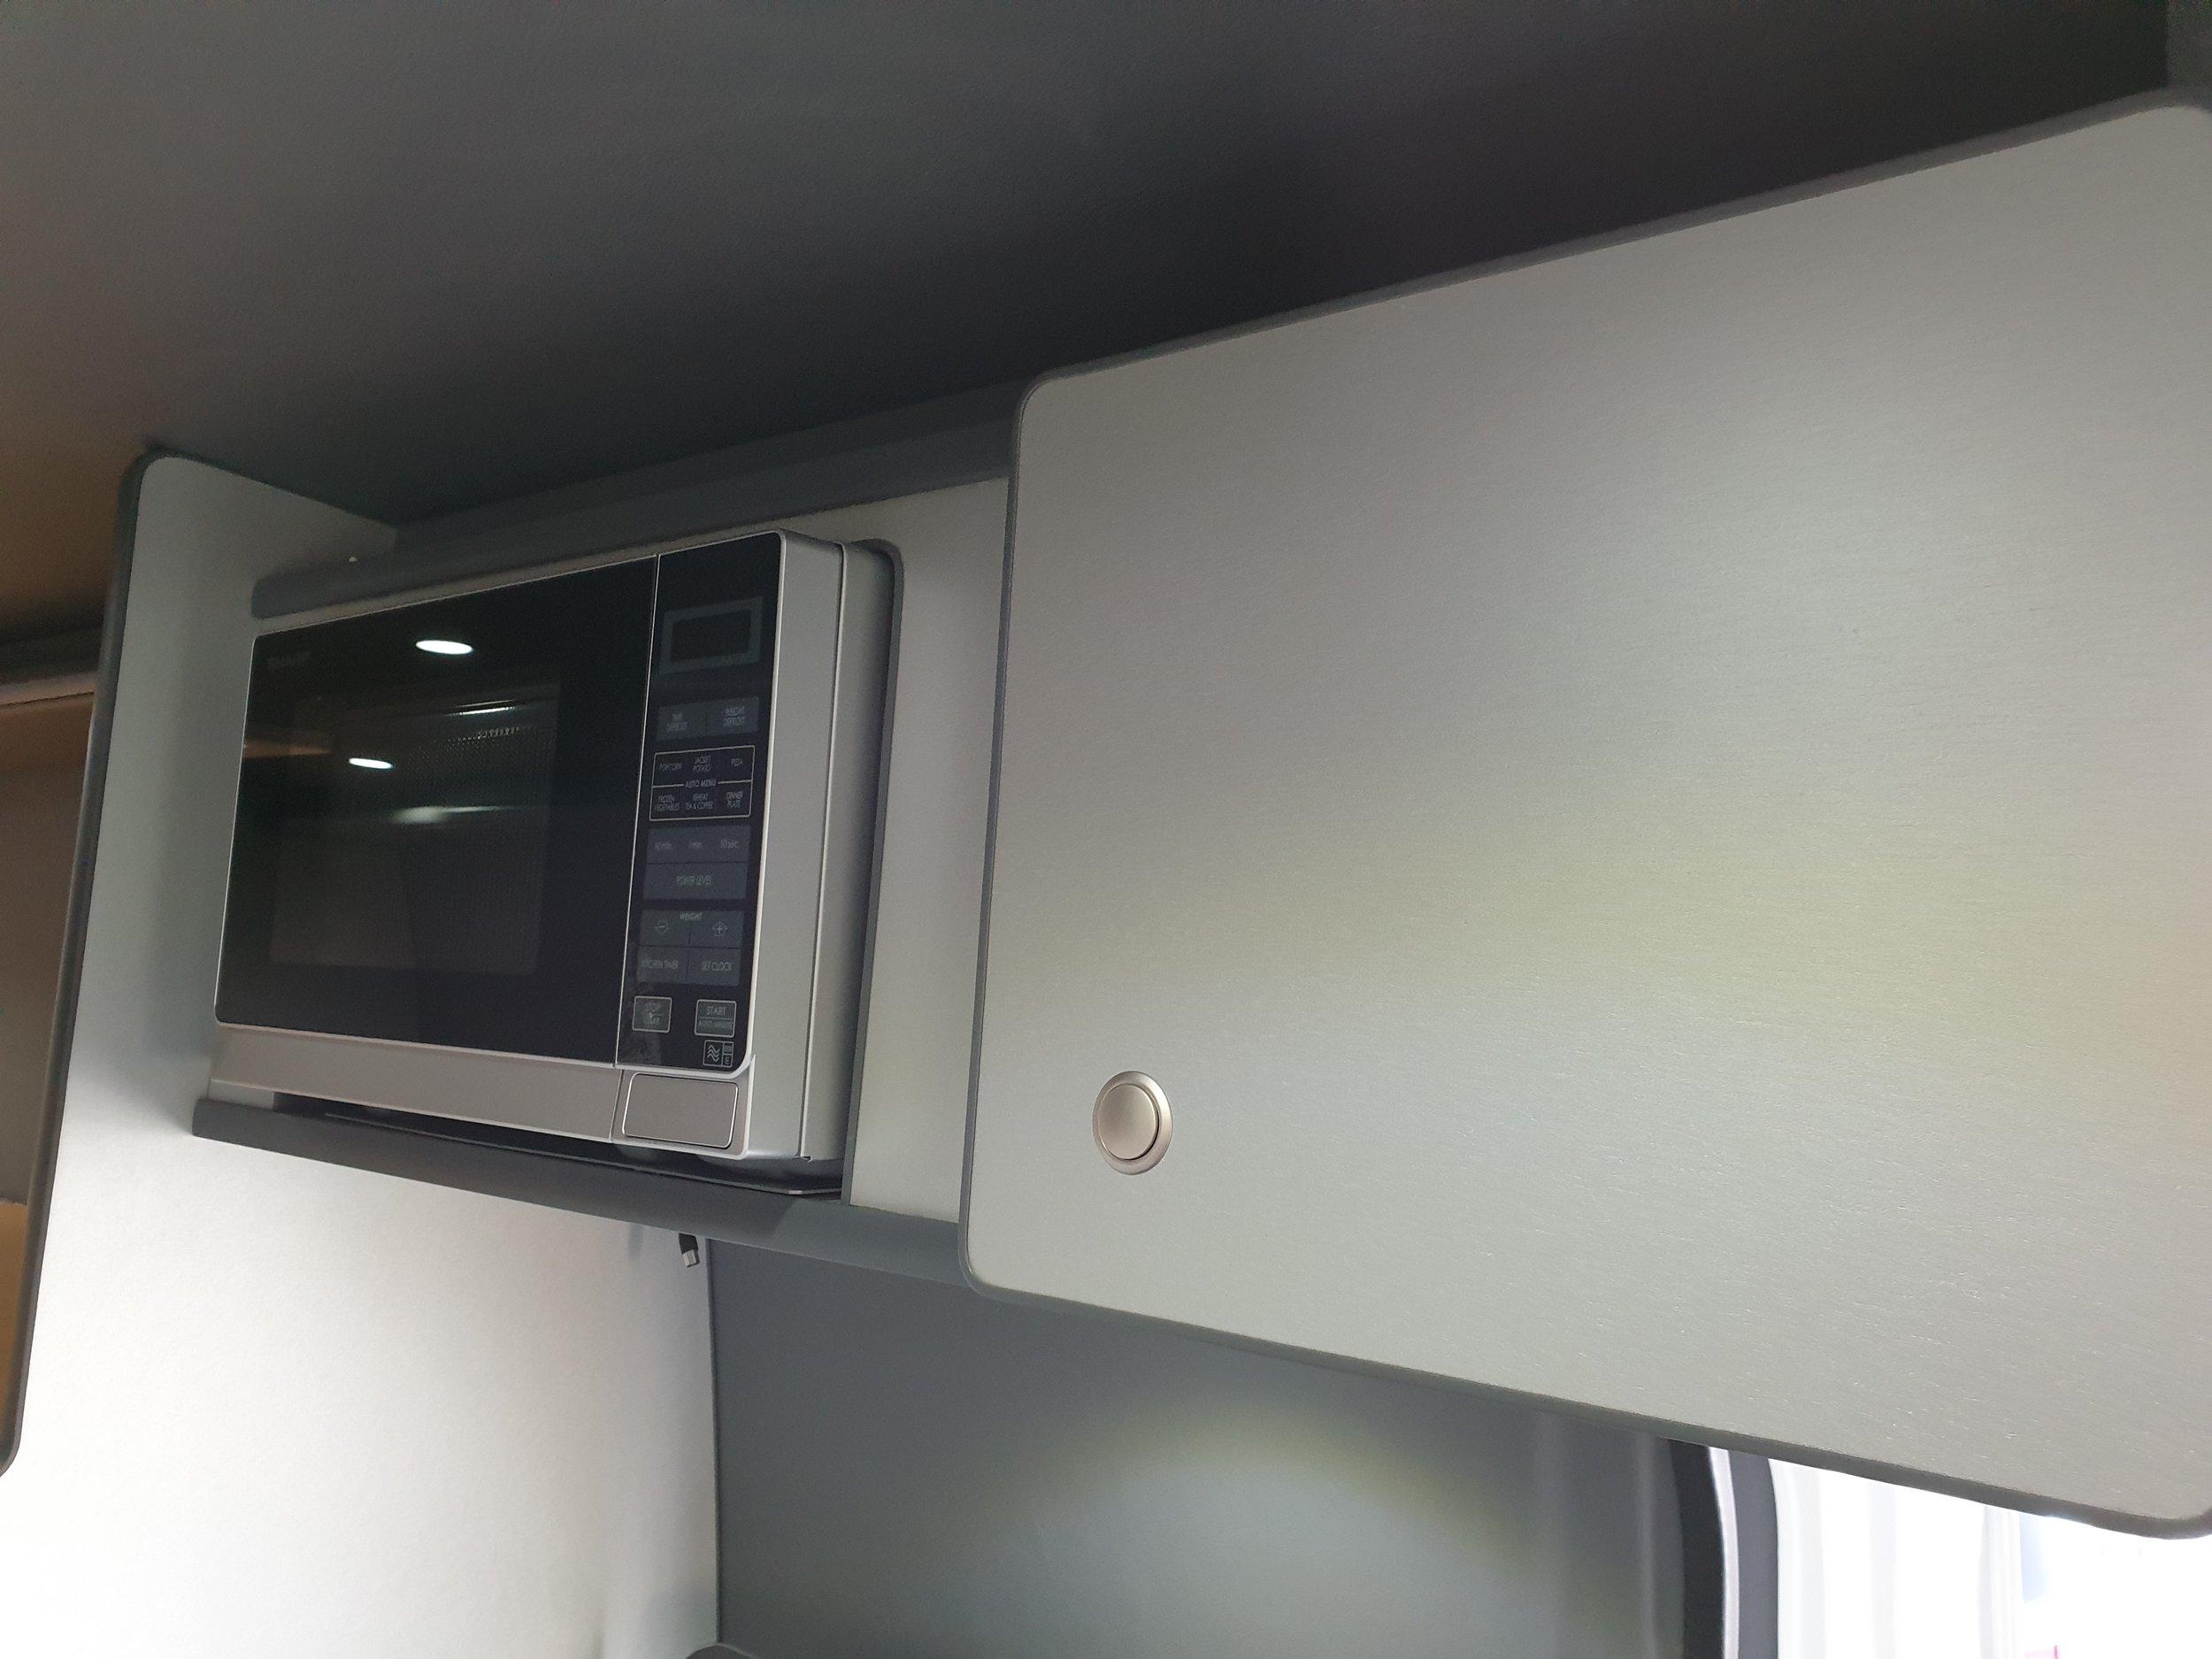 sharp microwave and storage